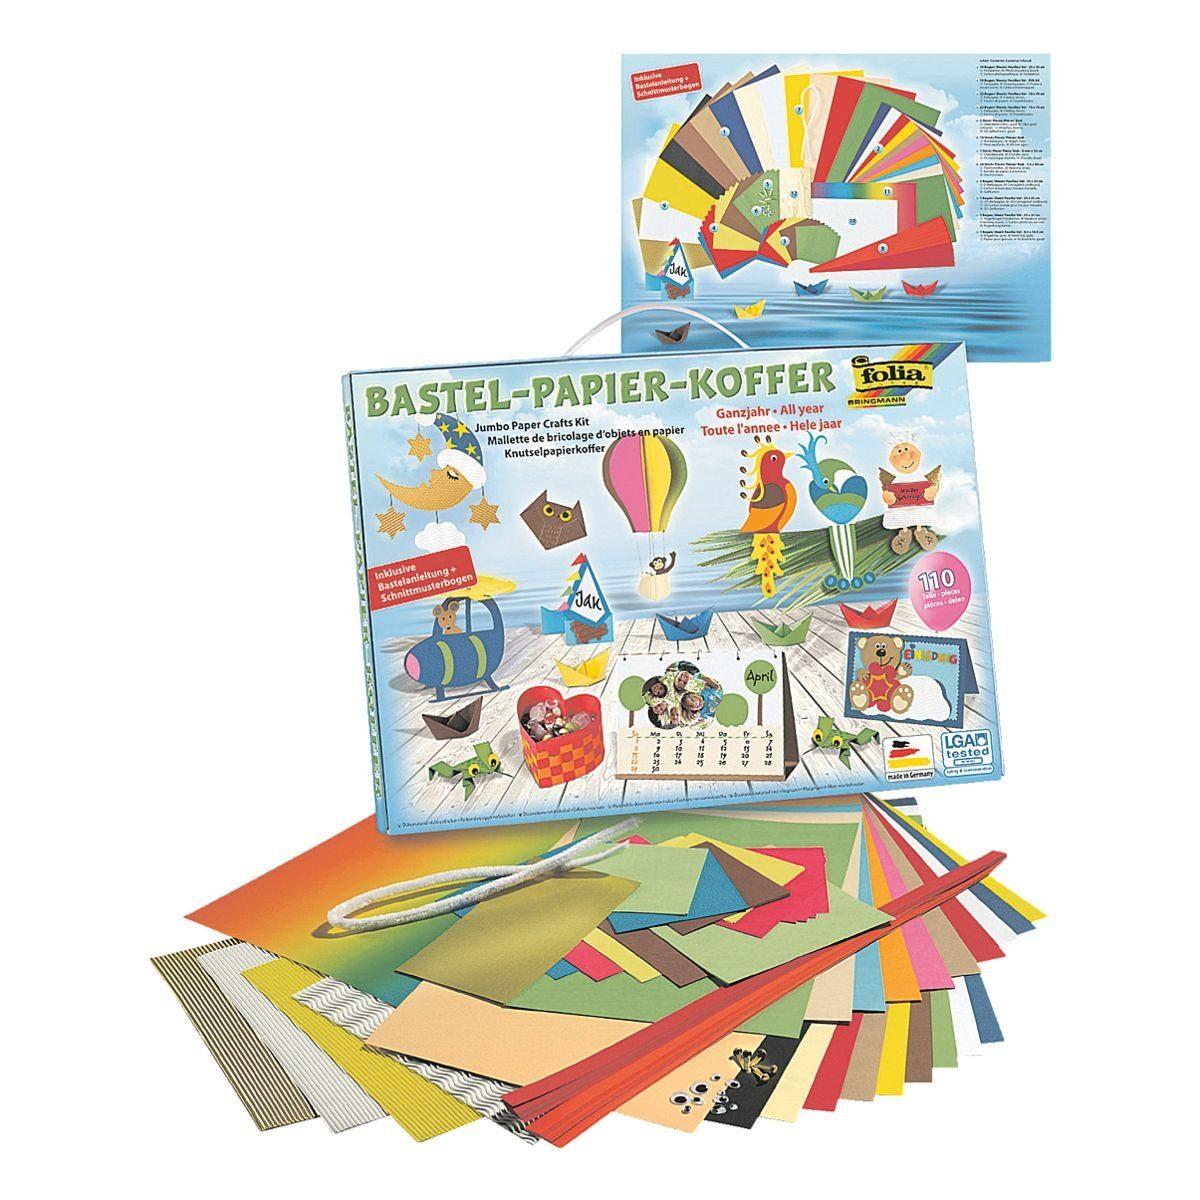 Folia Bastelpapier-Koffer »Ganzjahr 110-teilig«